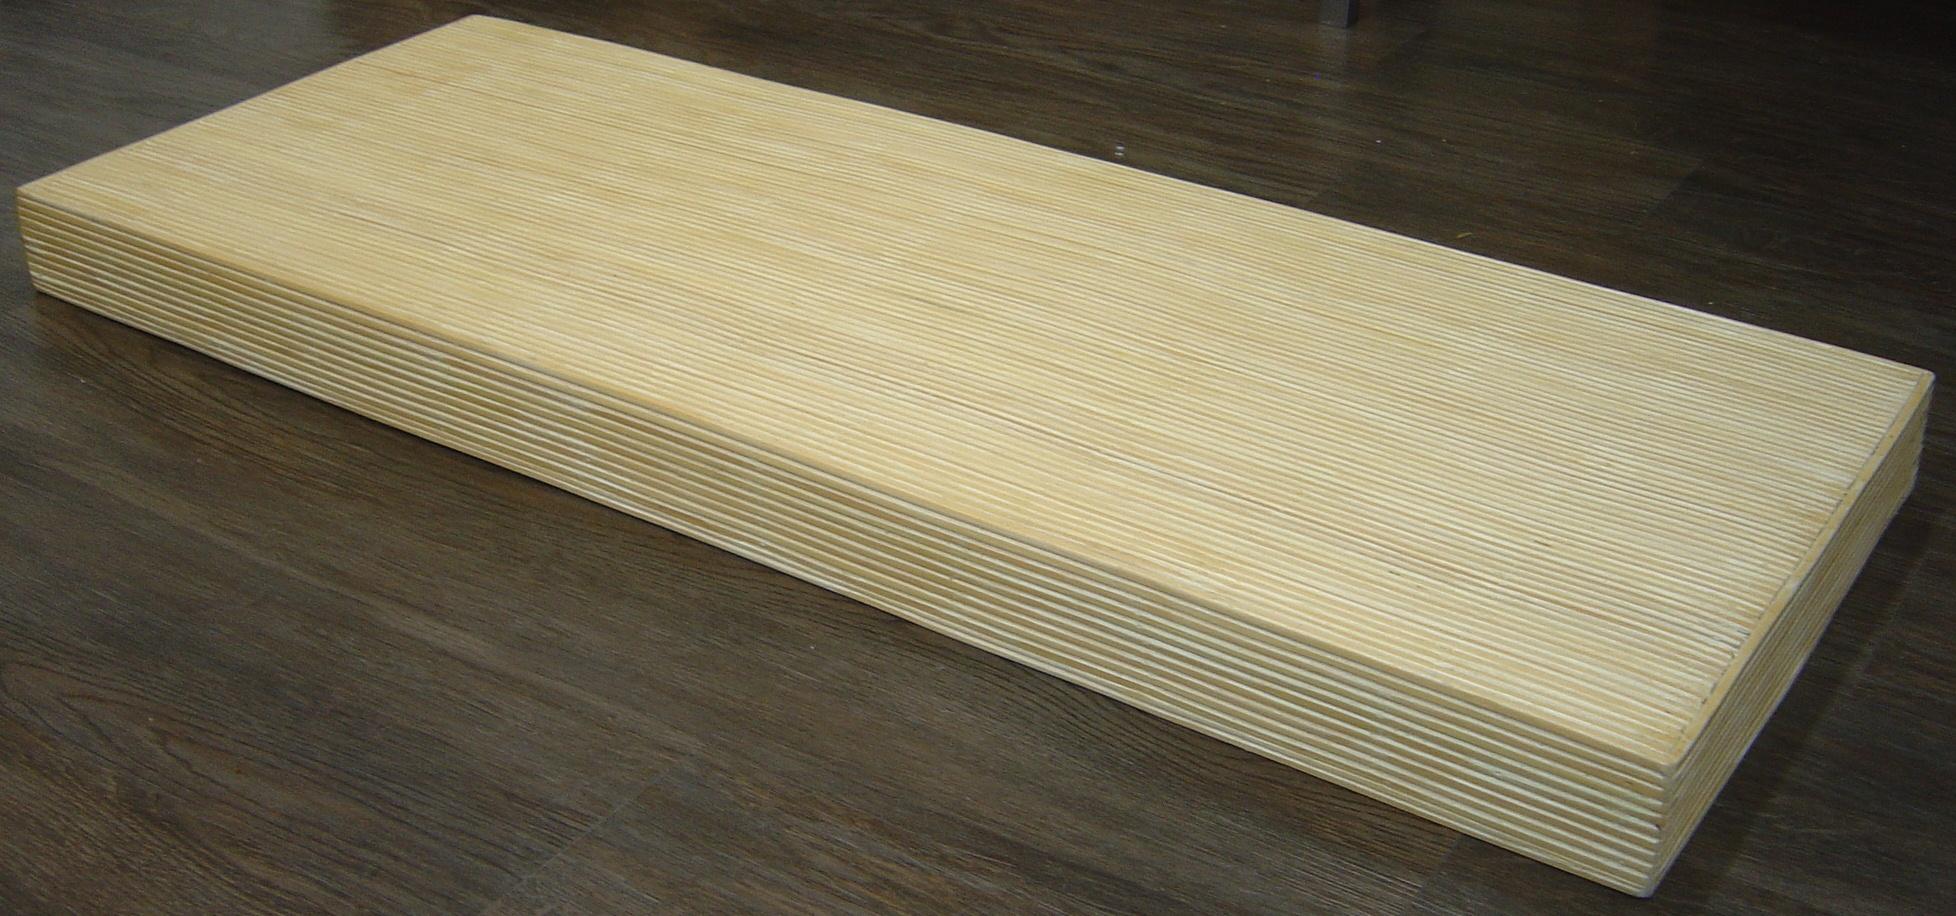 Appendini e moduli mensola tamburata in stik bamboo for Mensola tamburata